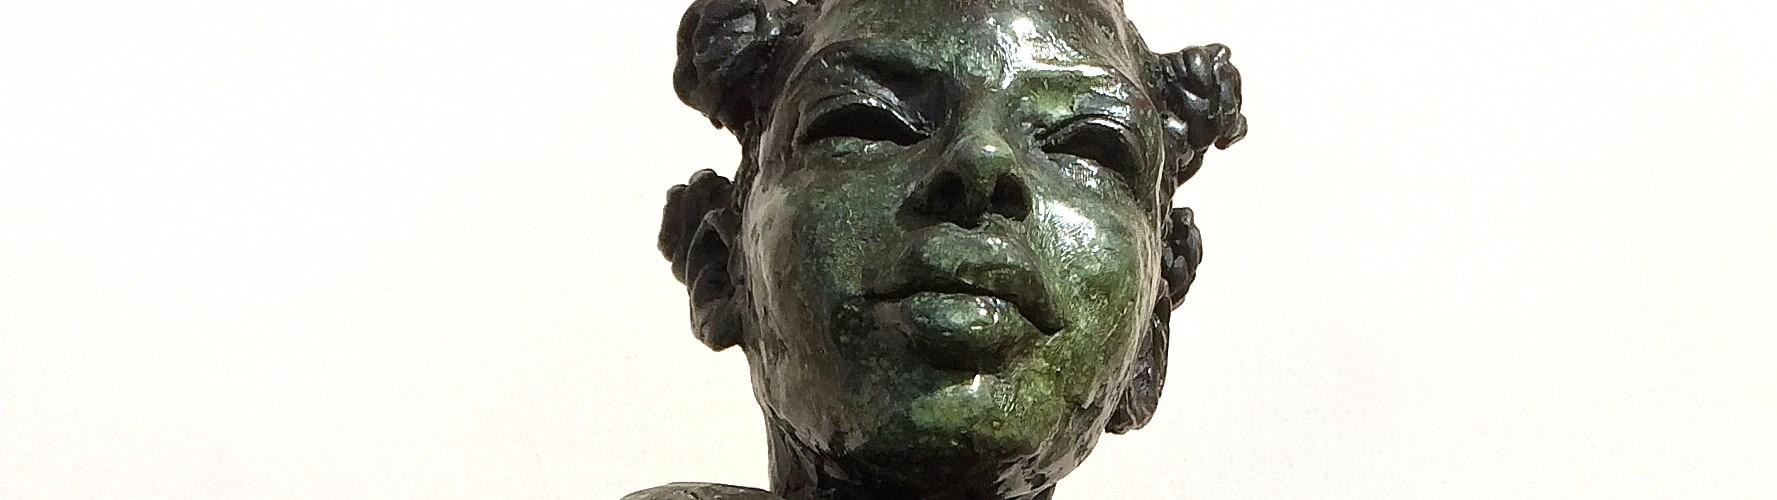 Ella Bronze female sculpture bust of black woman by artist Manuel Palacio